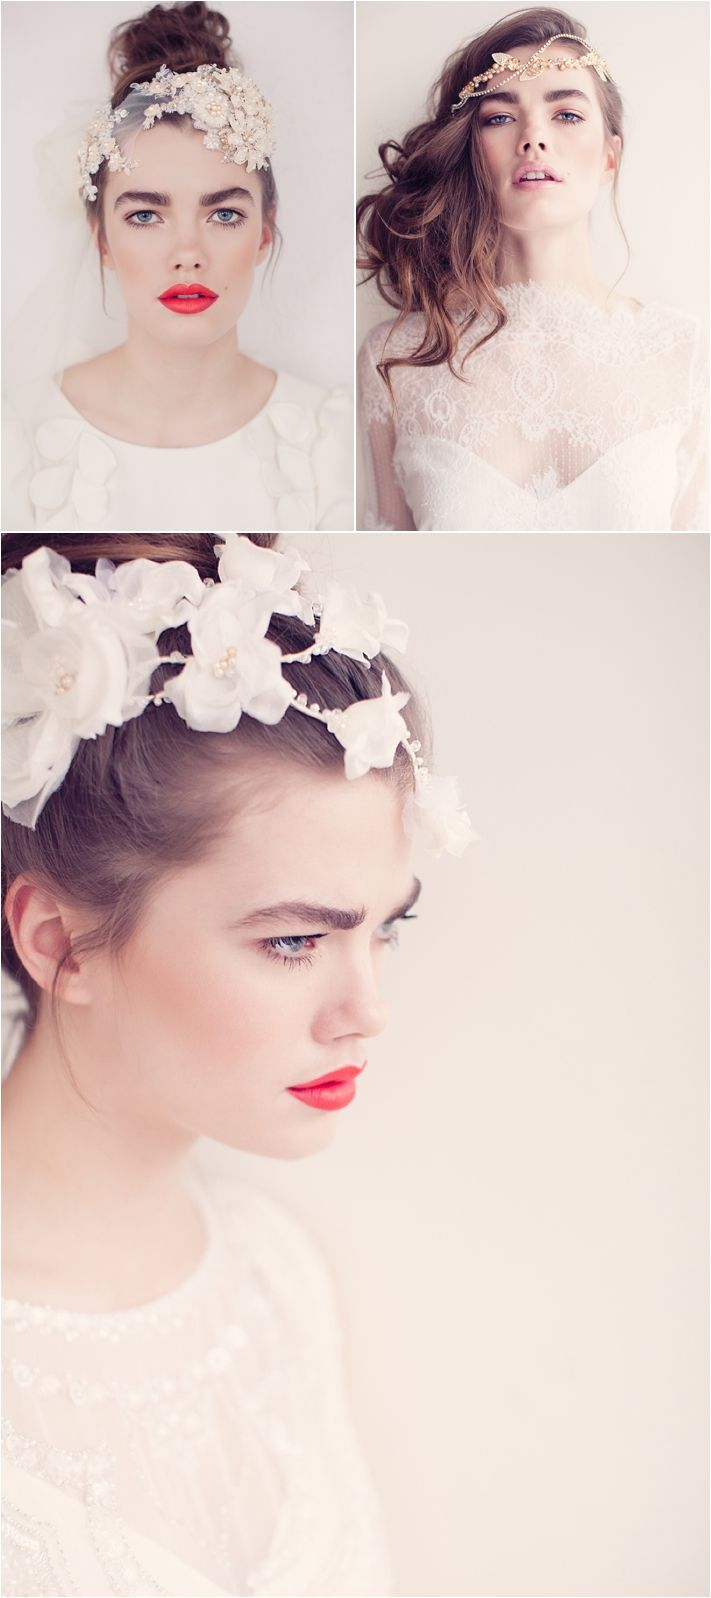 Janie Baltzer Bridal - Smitten Magazine - Photography by  Sandra Åberg Photography  http://smitten-mag.com/category/bridal-style/  #smittenmagazine #wedding #bridal #weddingphotography